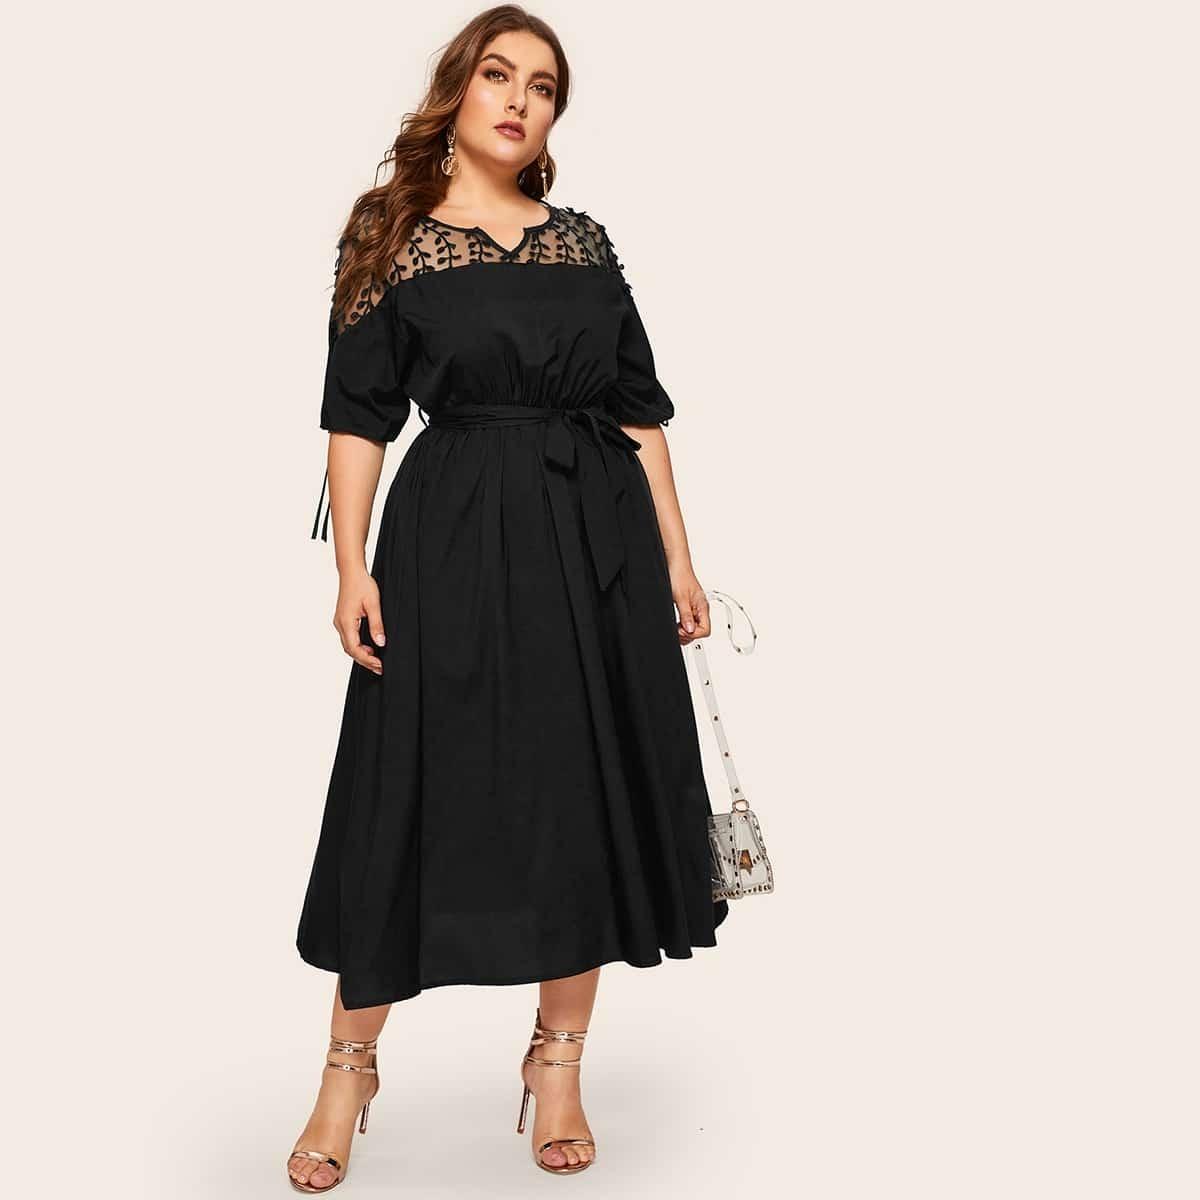 Zwart Casual Vlak Grote maten jurken Contrast mesh